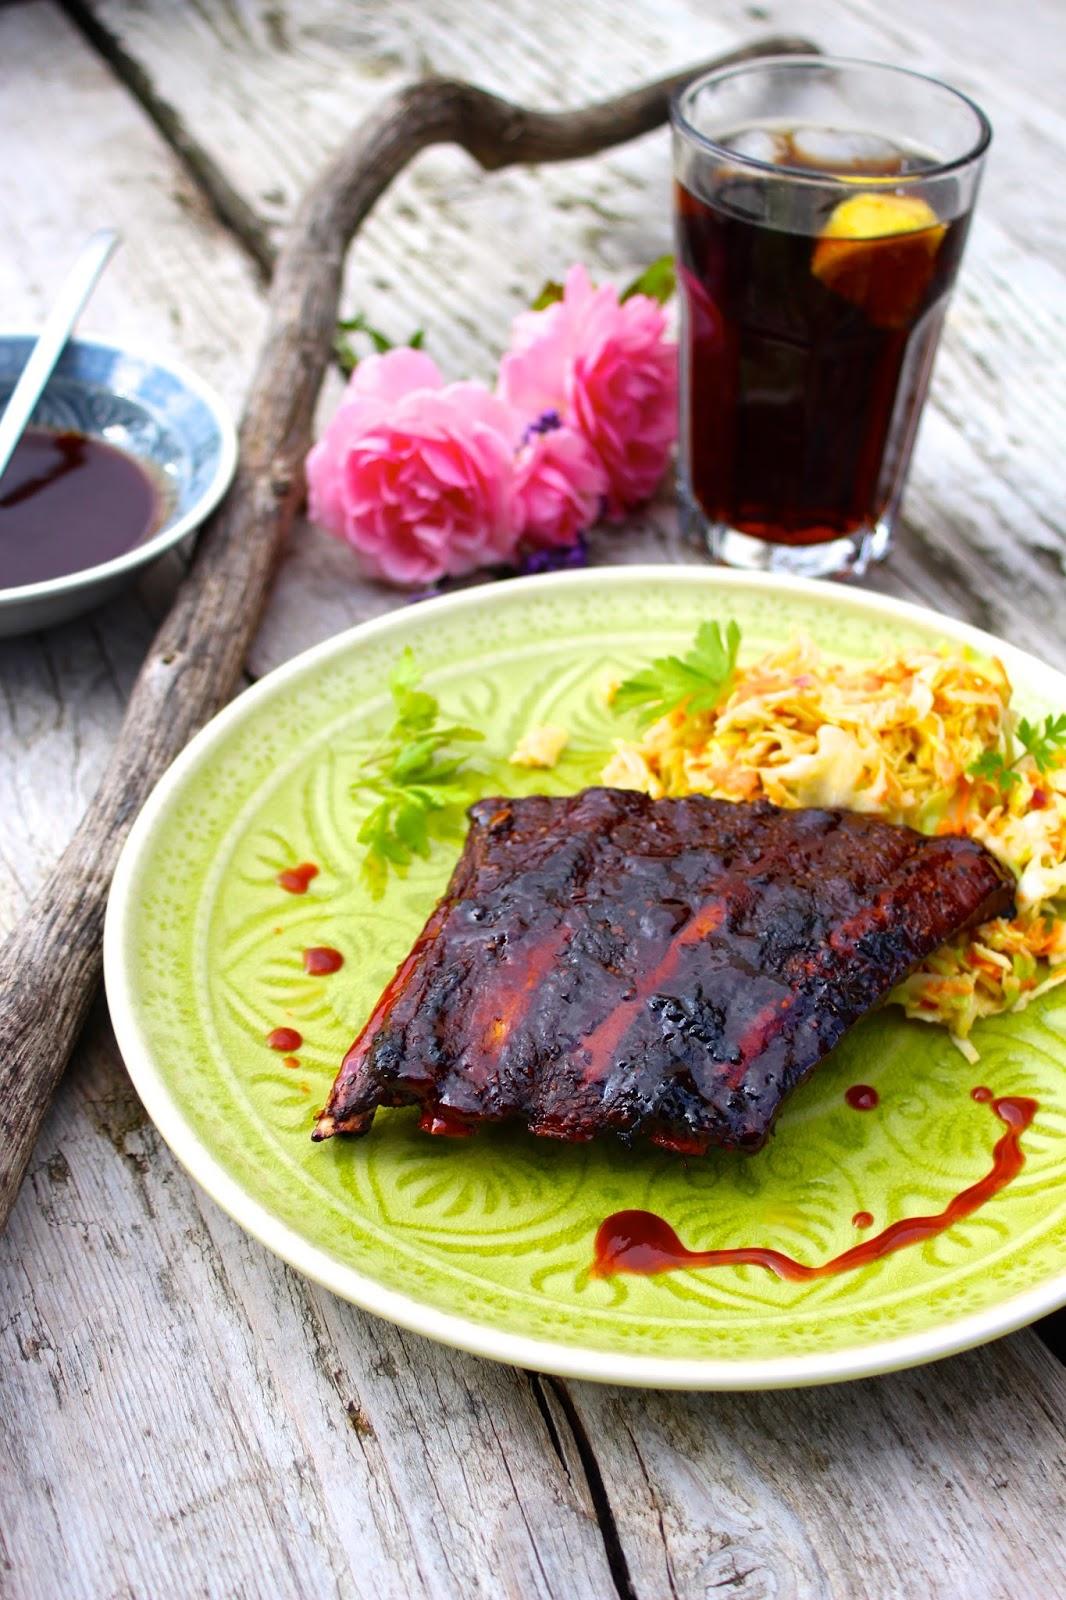 paulas frauchen spare ribs aus dem ofen mit coleslaw. Black Bedroom Furniture Sets. Home Design Ideas